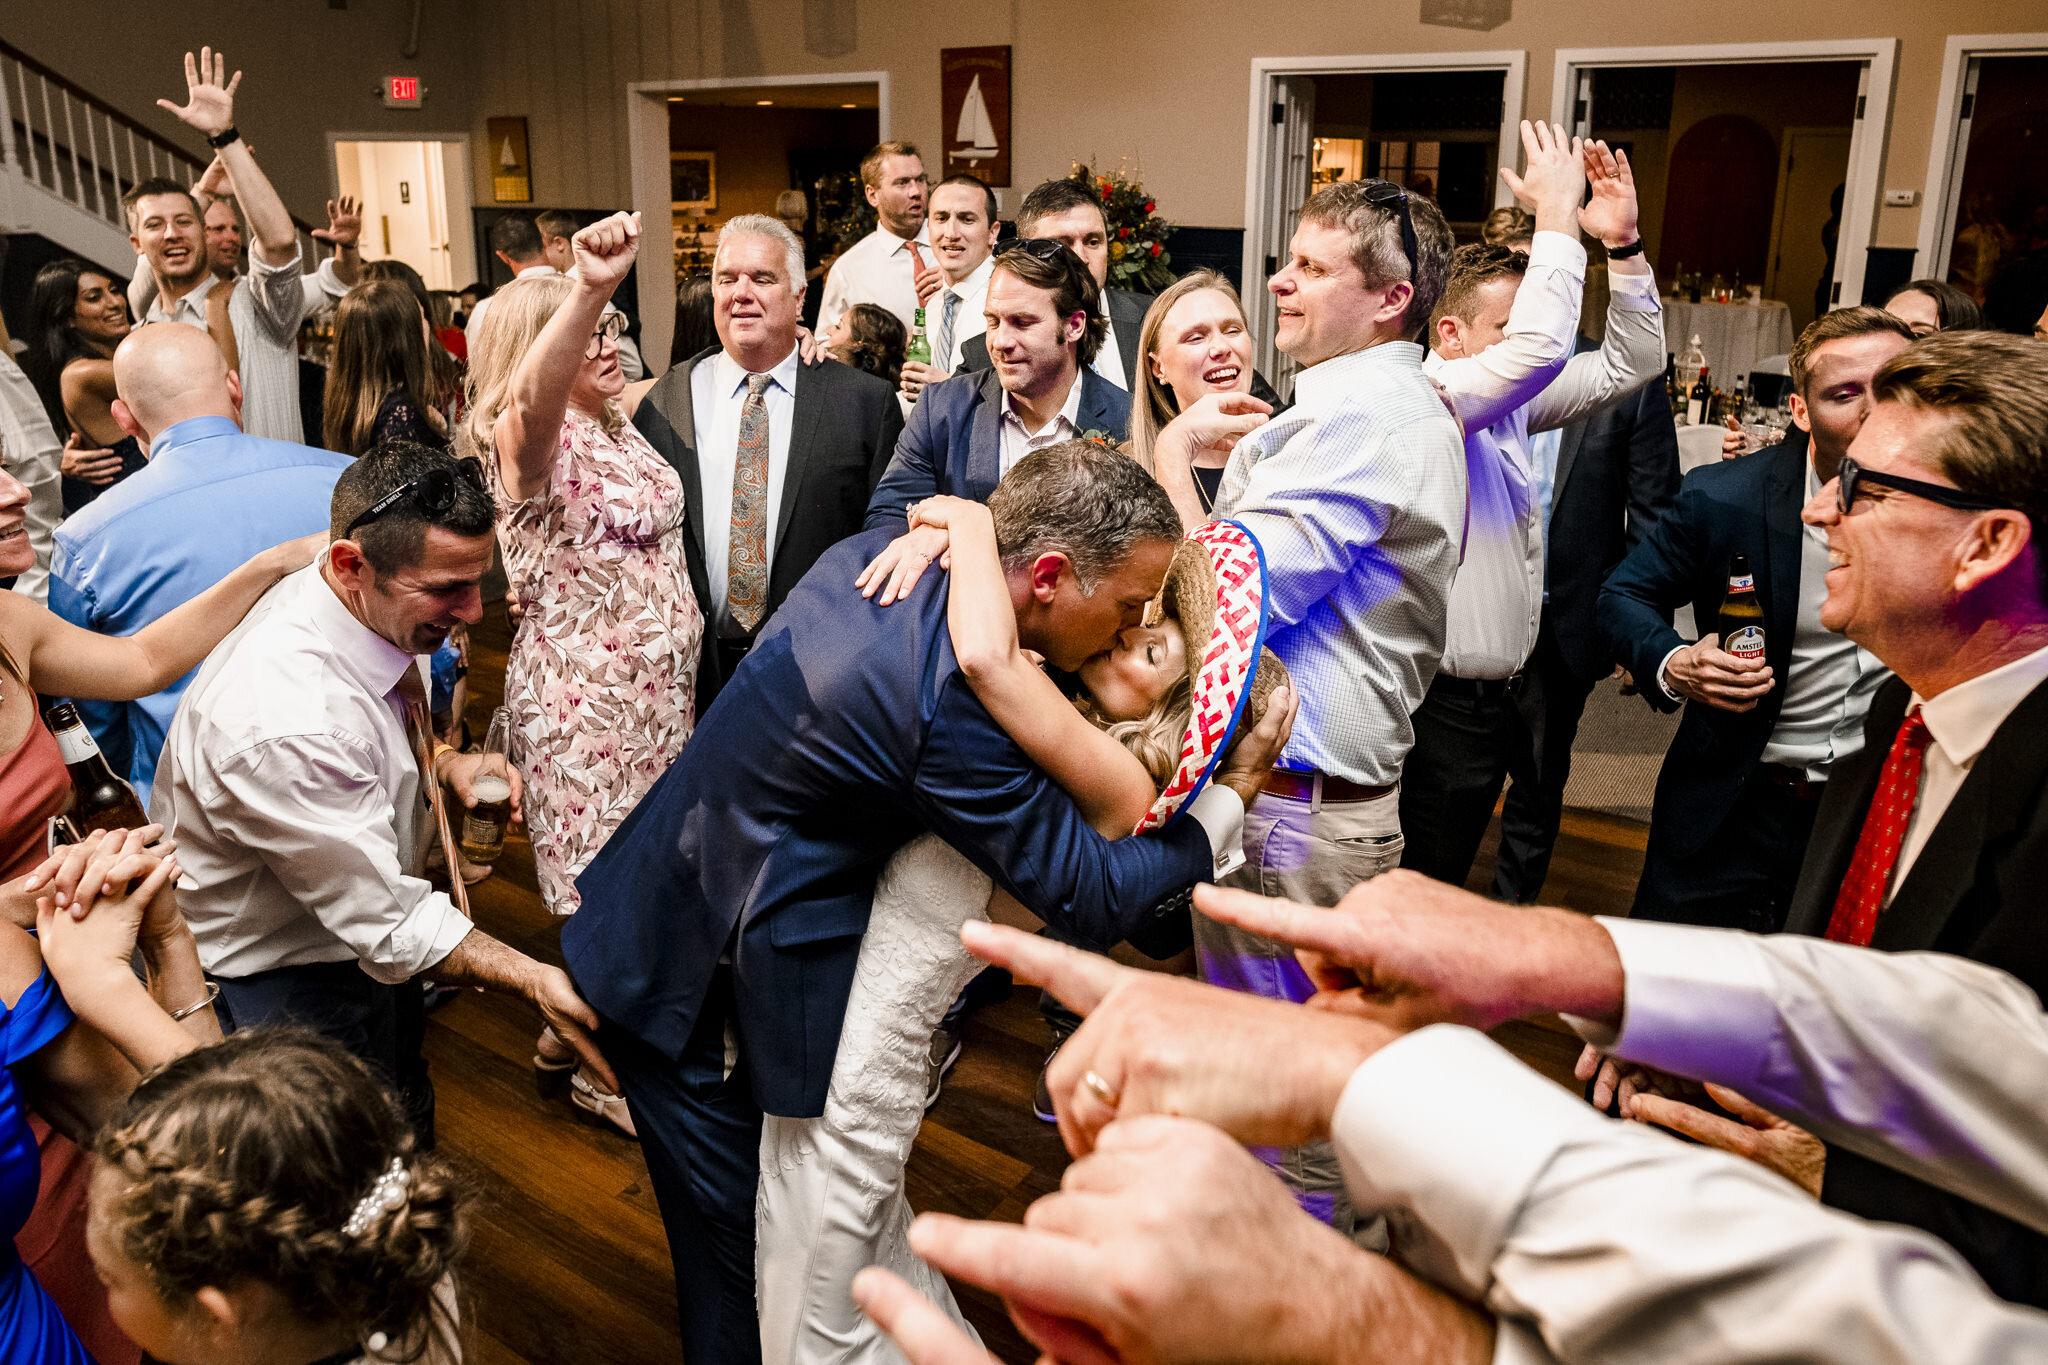 Snell-Ocean-City-Yacht-Club-New-Jersey-Wedding-Photographer-40.JPG